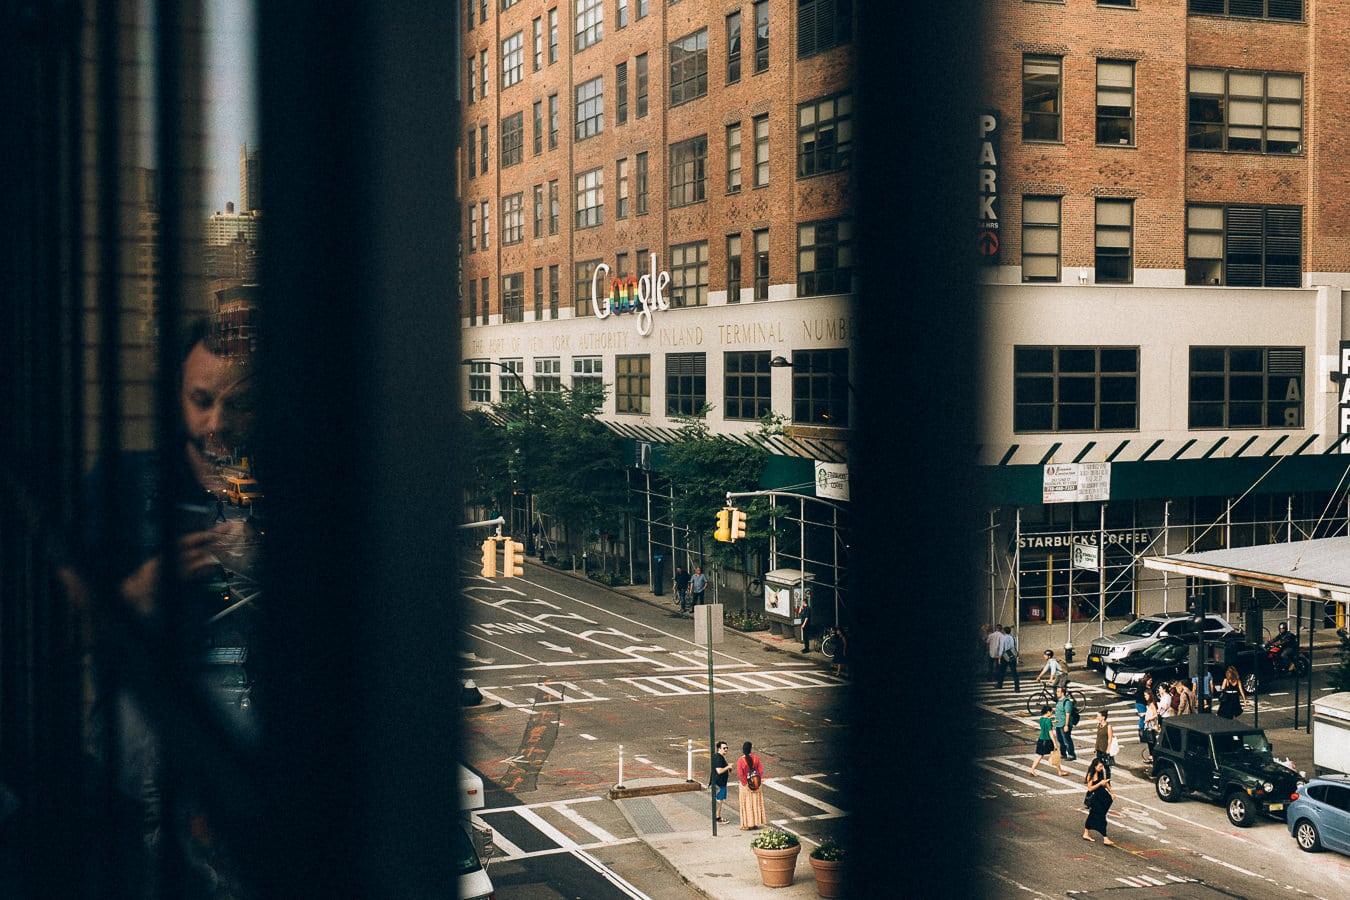 14th street nyc